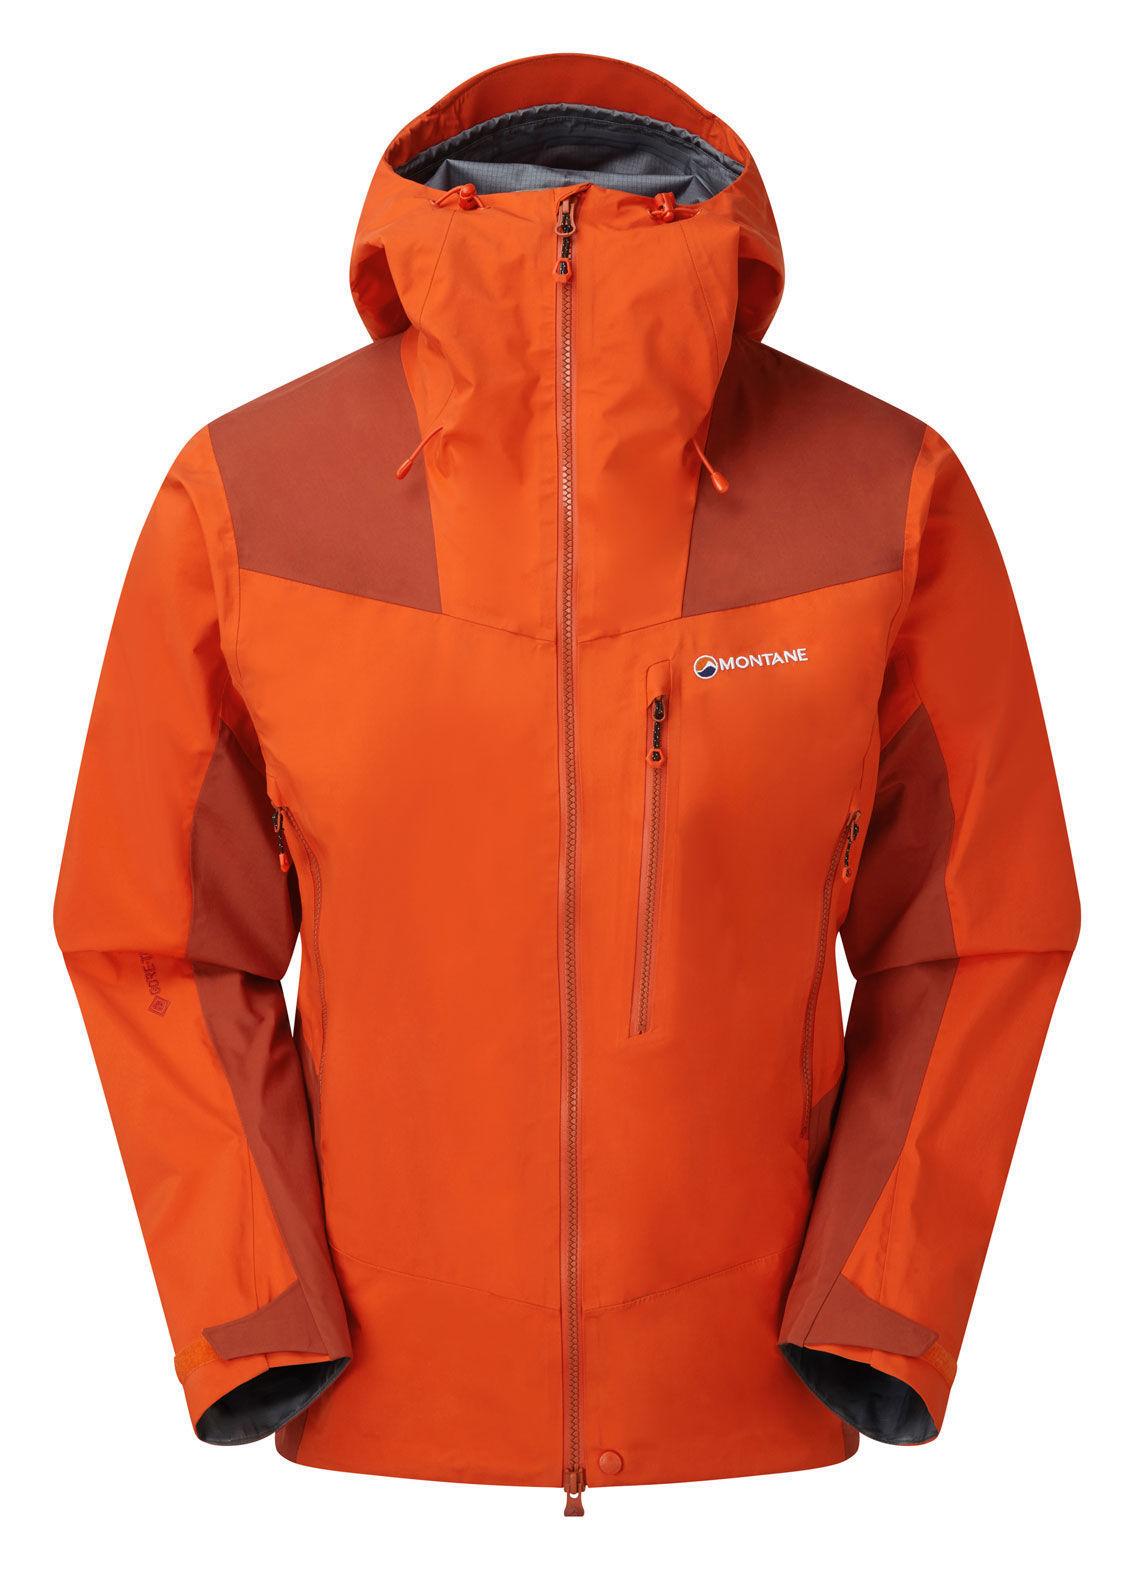 Montane Alpine Resolve Jacket, Firefly Orange, M